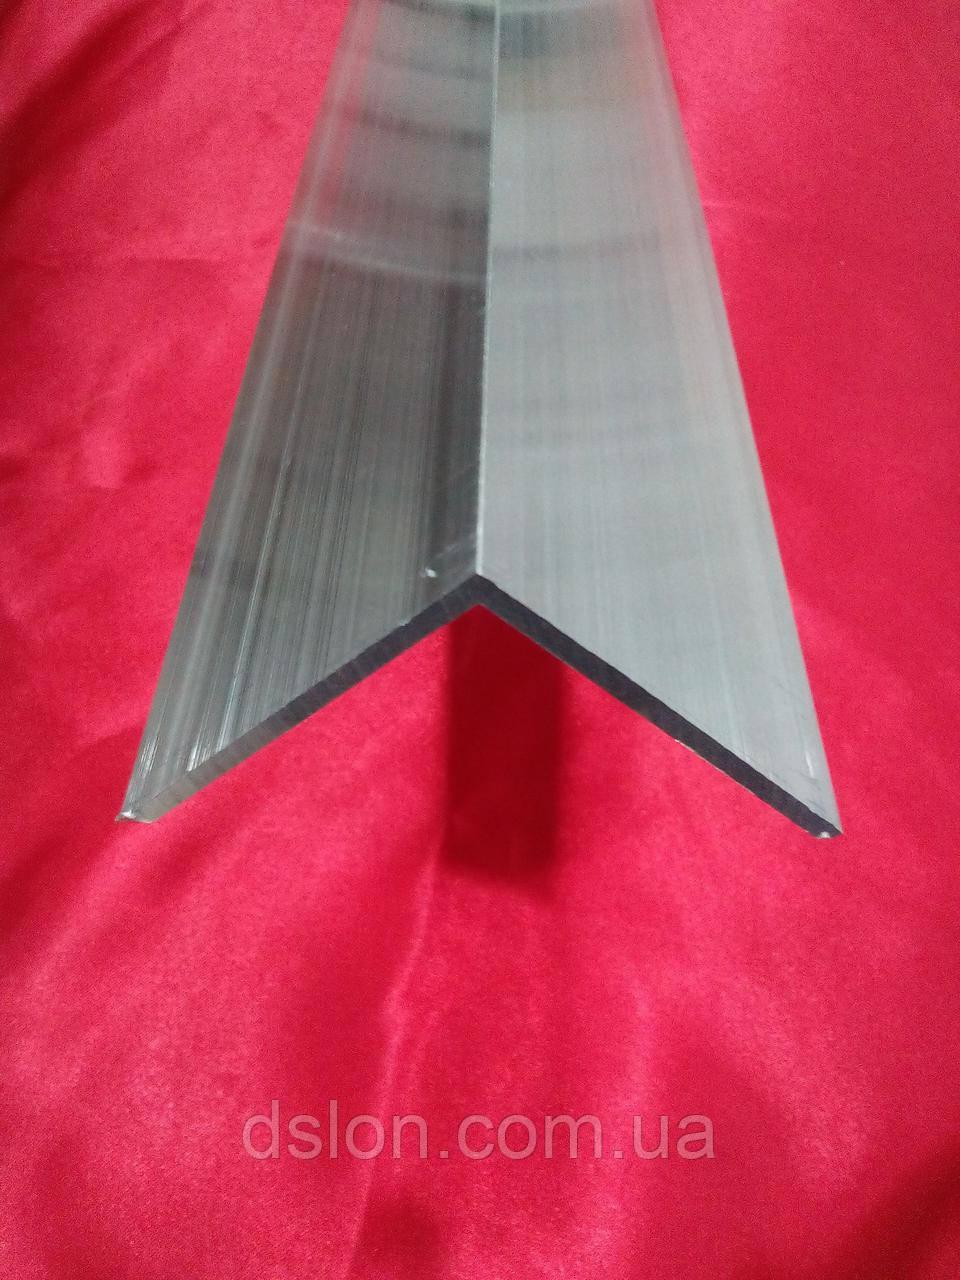 Уголок алюминиевый 50*50*2 мм